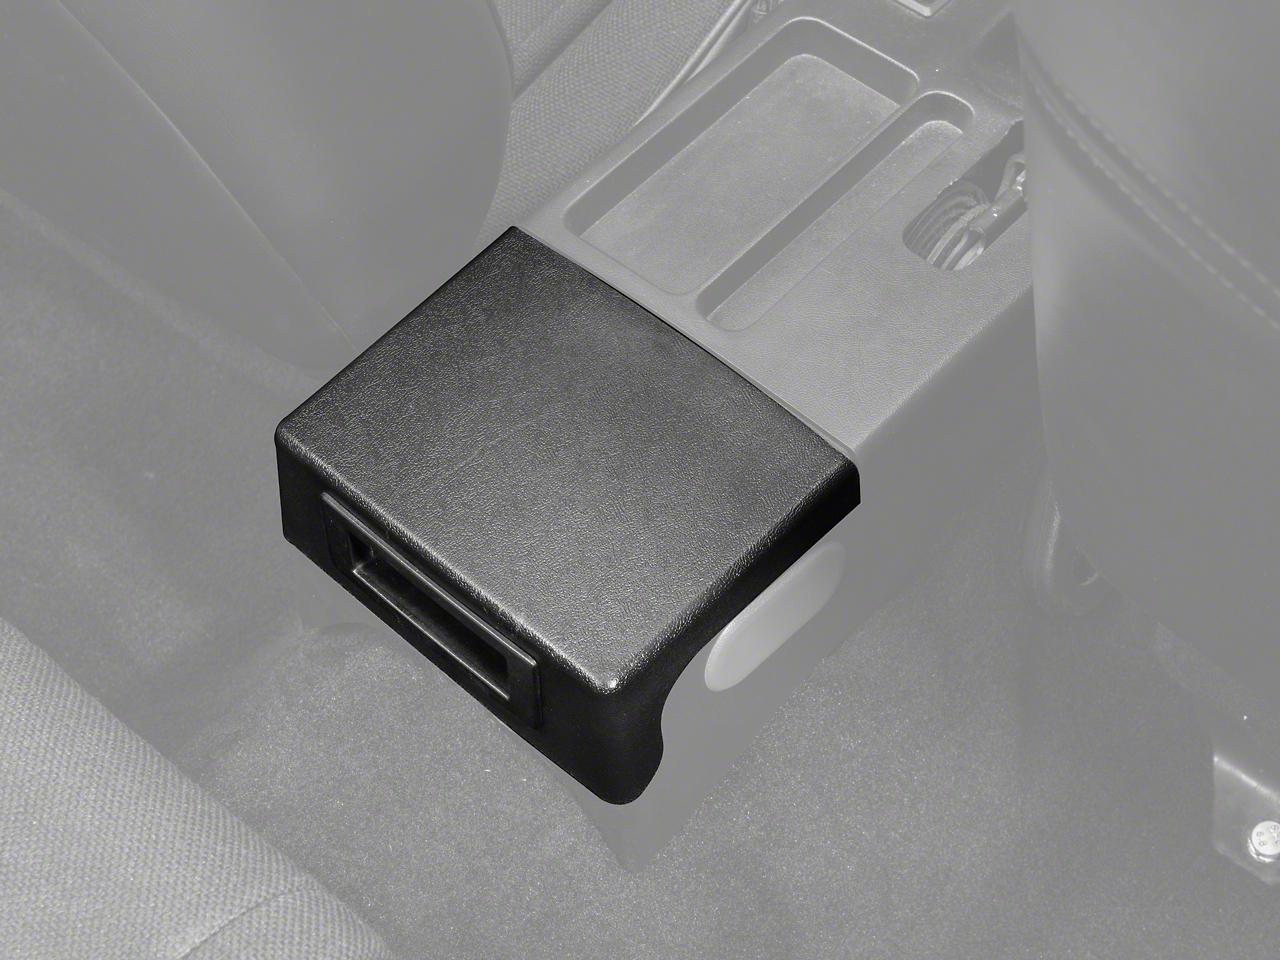 Center Console Arm Rest Delete Plate - Black (87-93 All)